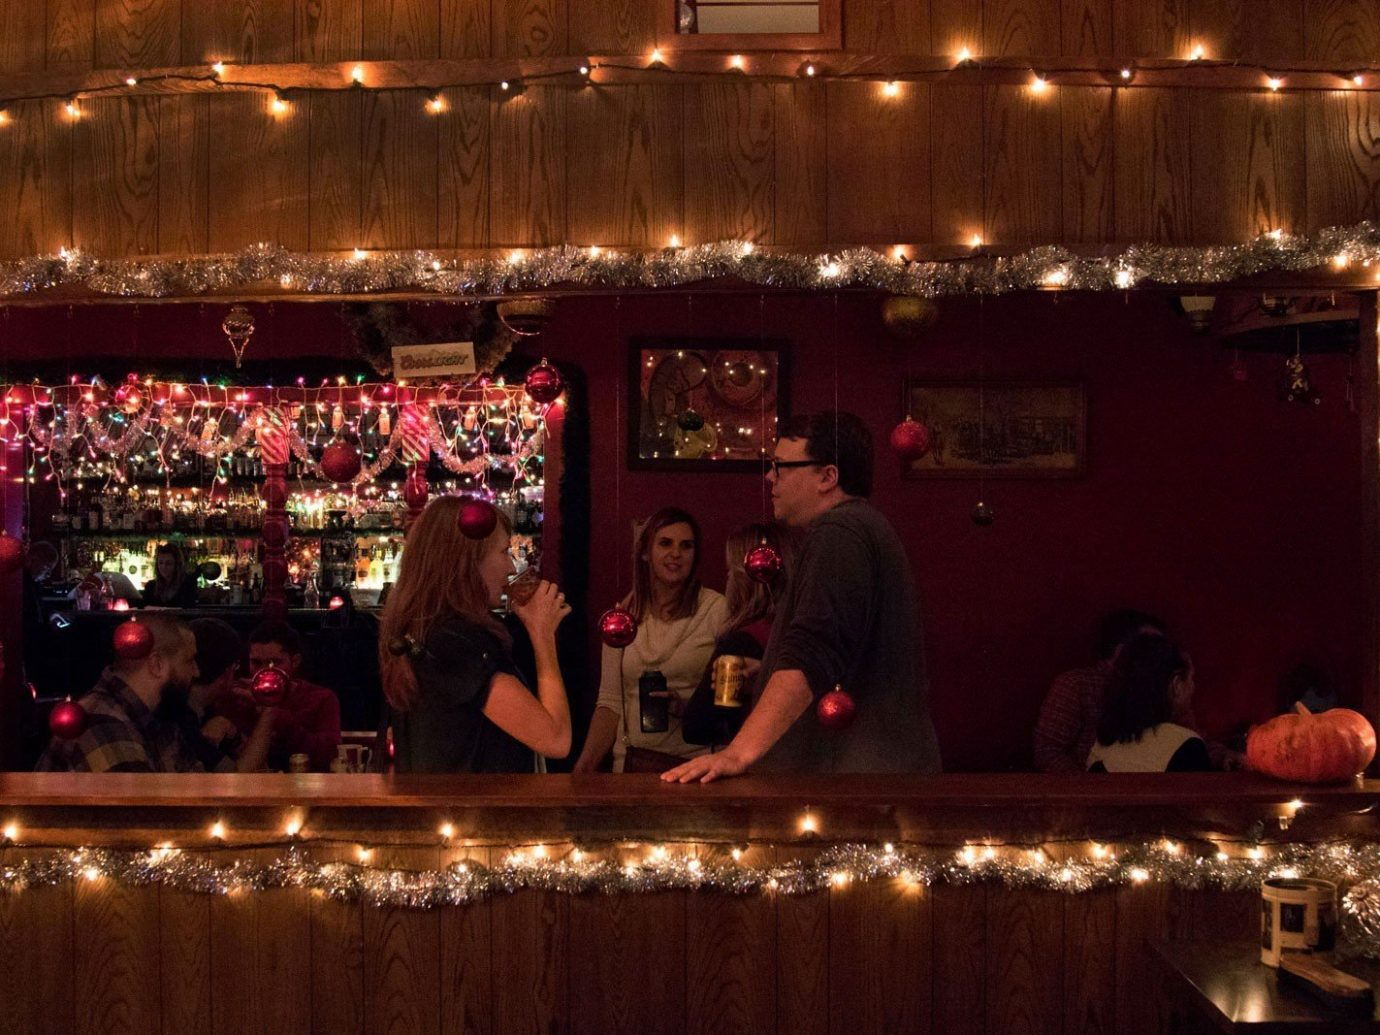 Food + Drink meal function hall nightclub banquet wedding reception Bar lit ballroom night